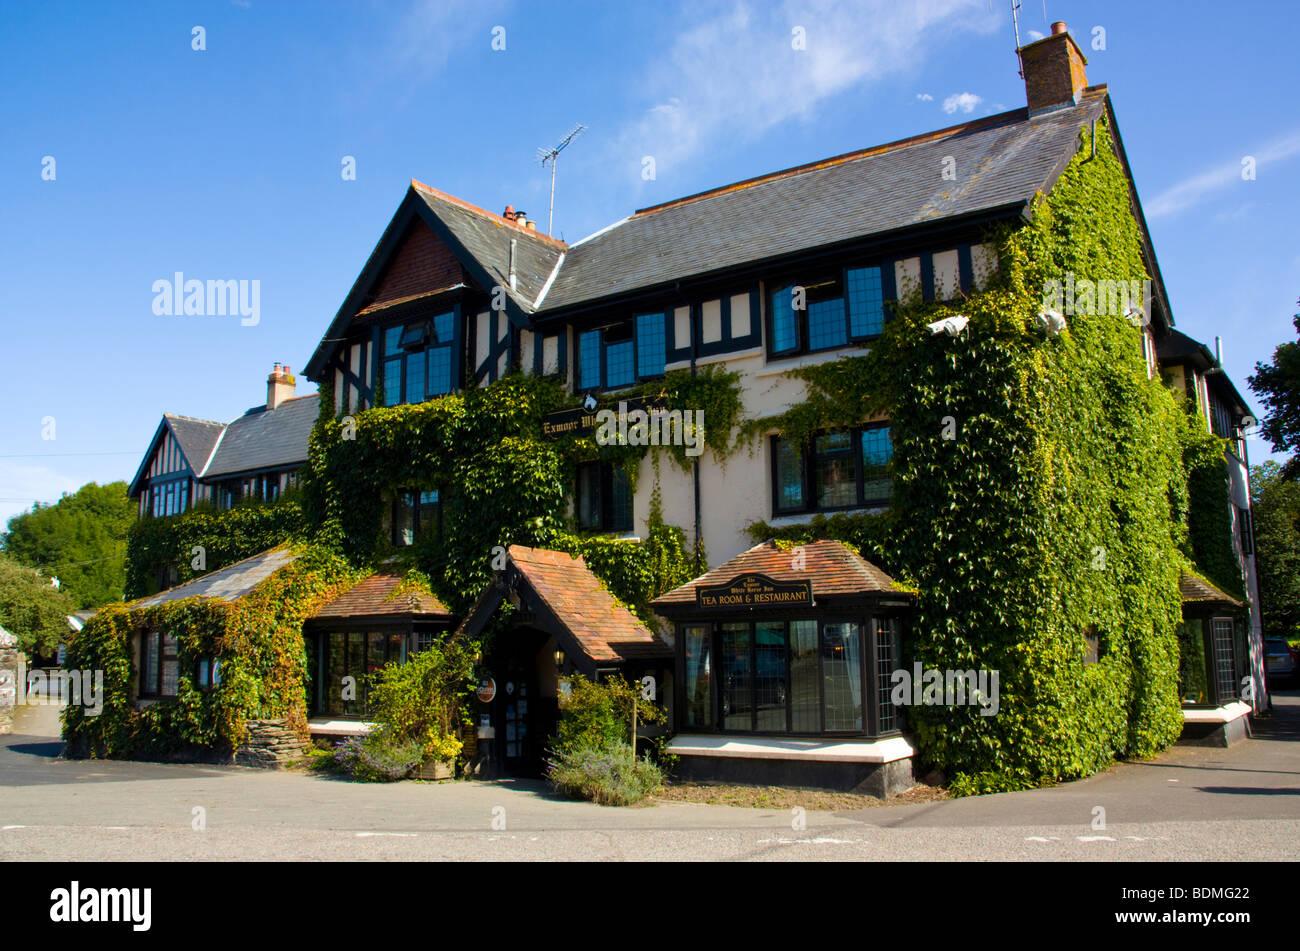 Exmoor White Horse Inn, Exford, Somerset England UK - Stock Image